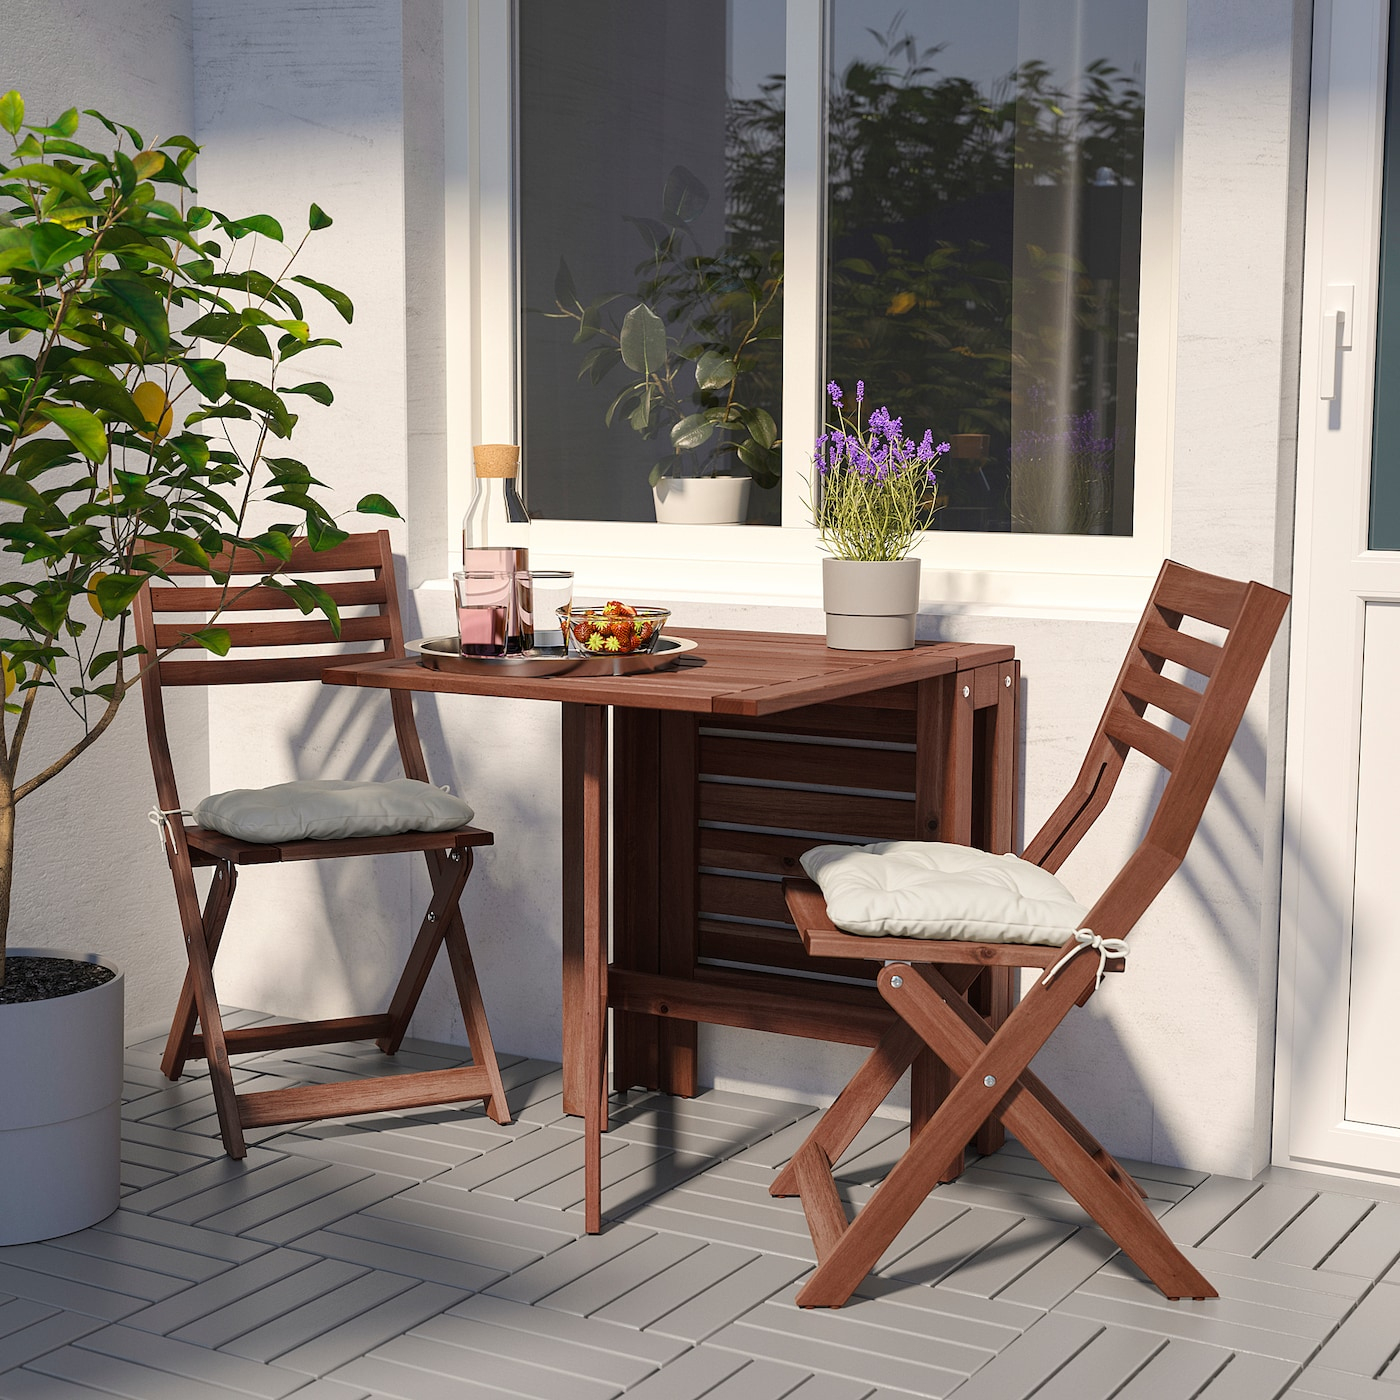 Äpplarö Gateleg Table, Outdoor - Brown Brown Stained 20/77/133X62 Cm destiné Desserte Jardin Ikea